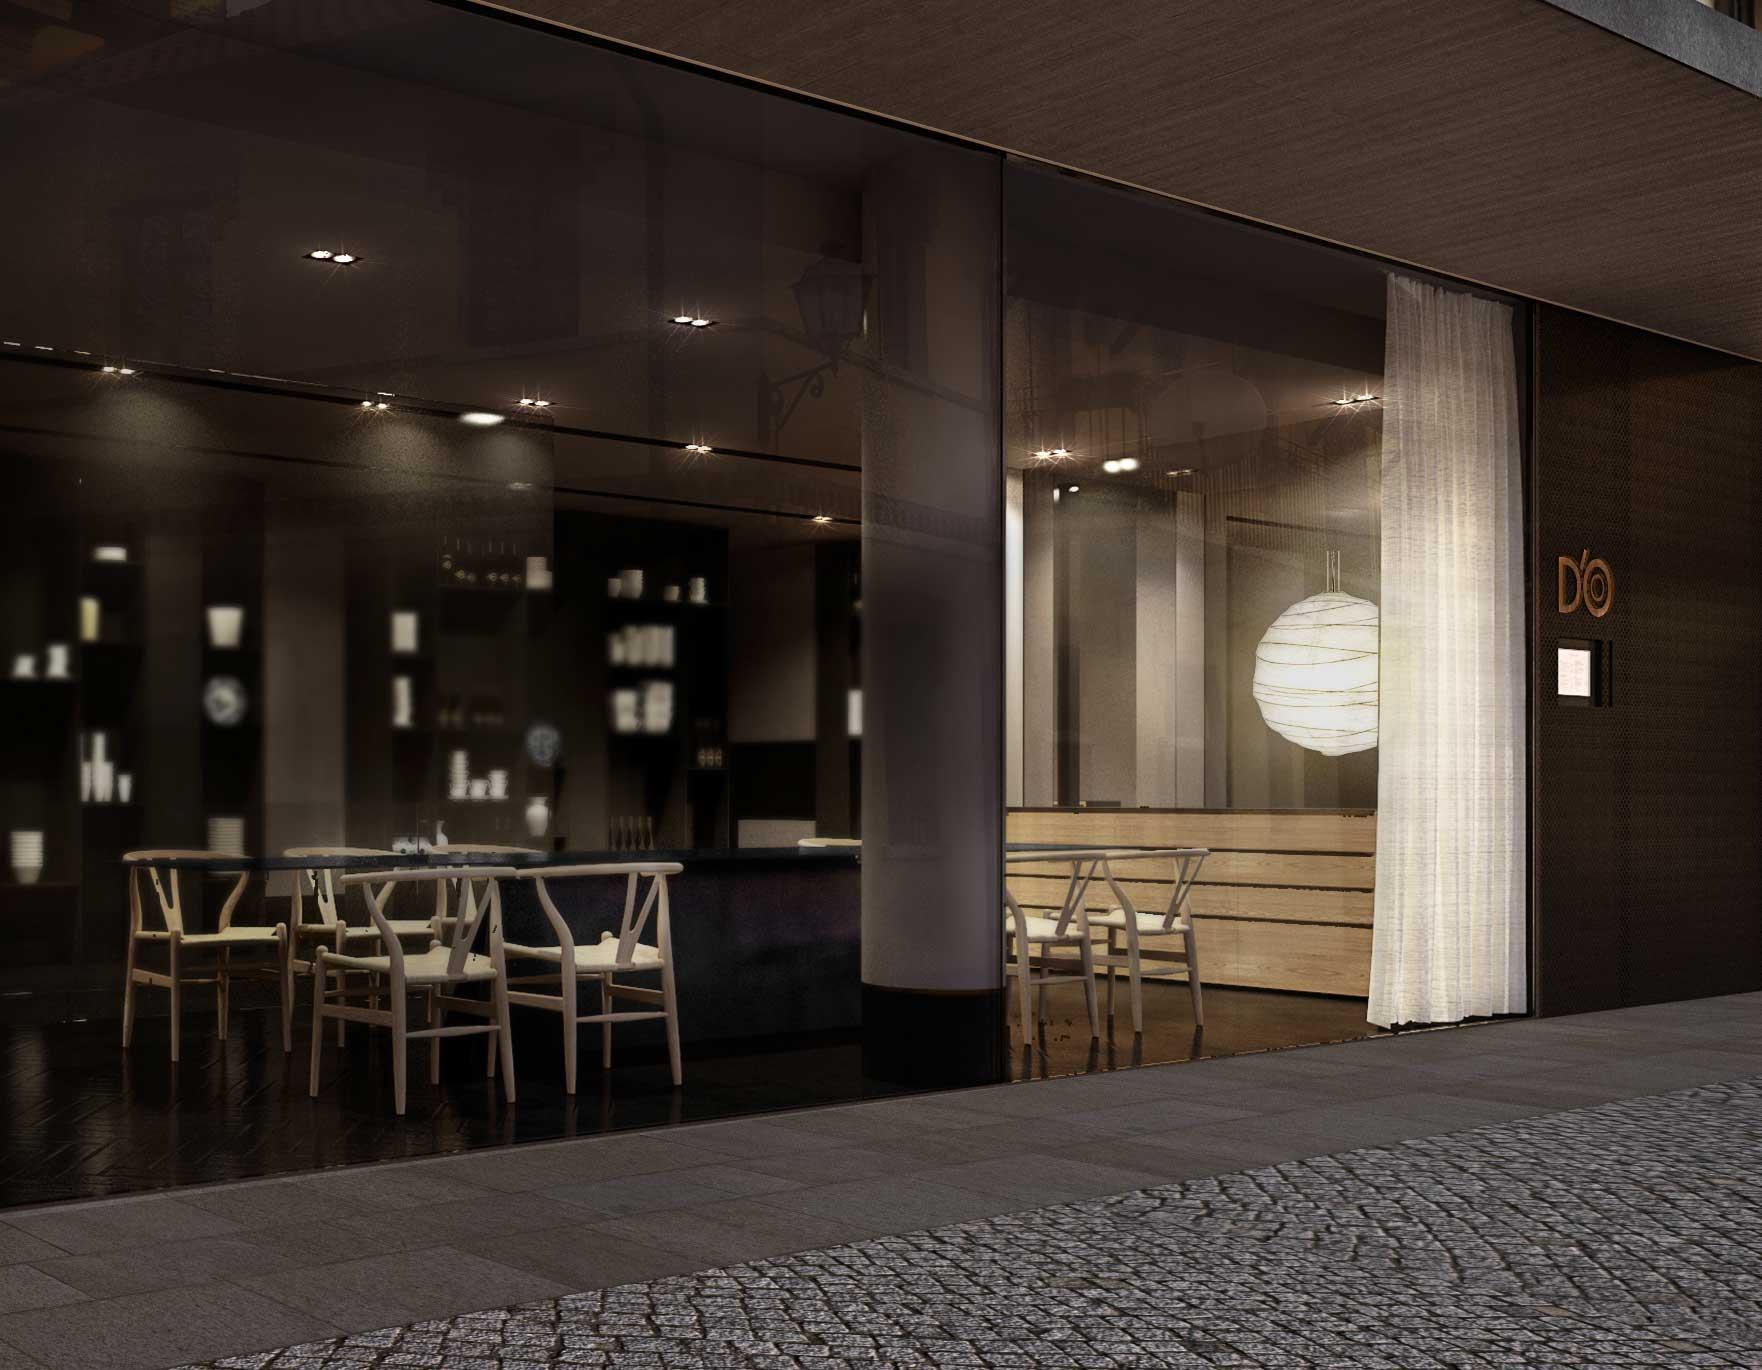 Nuovo ristorante Davide Oldani D'O